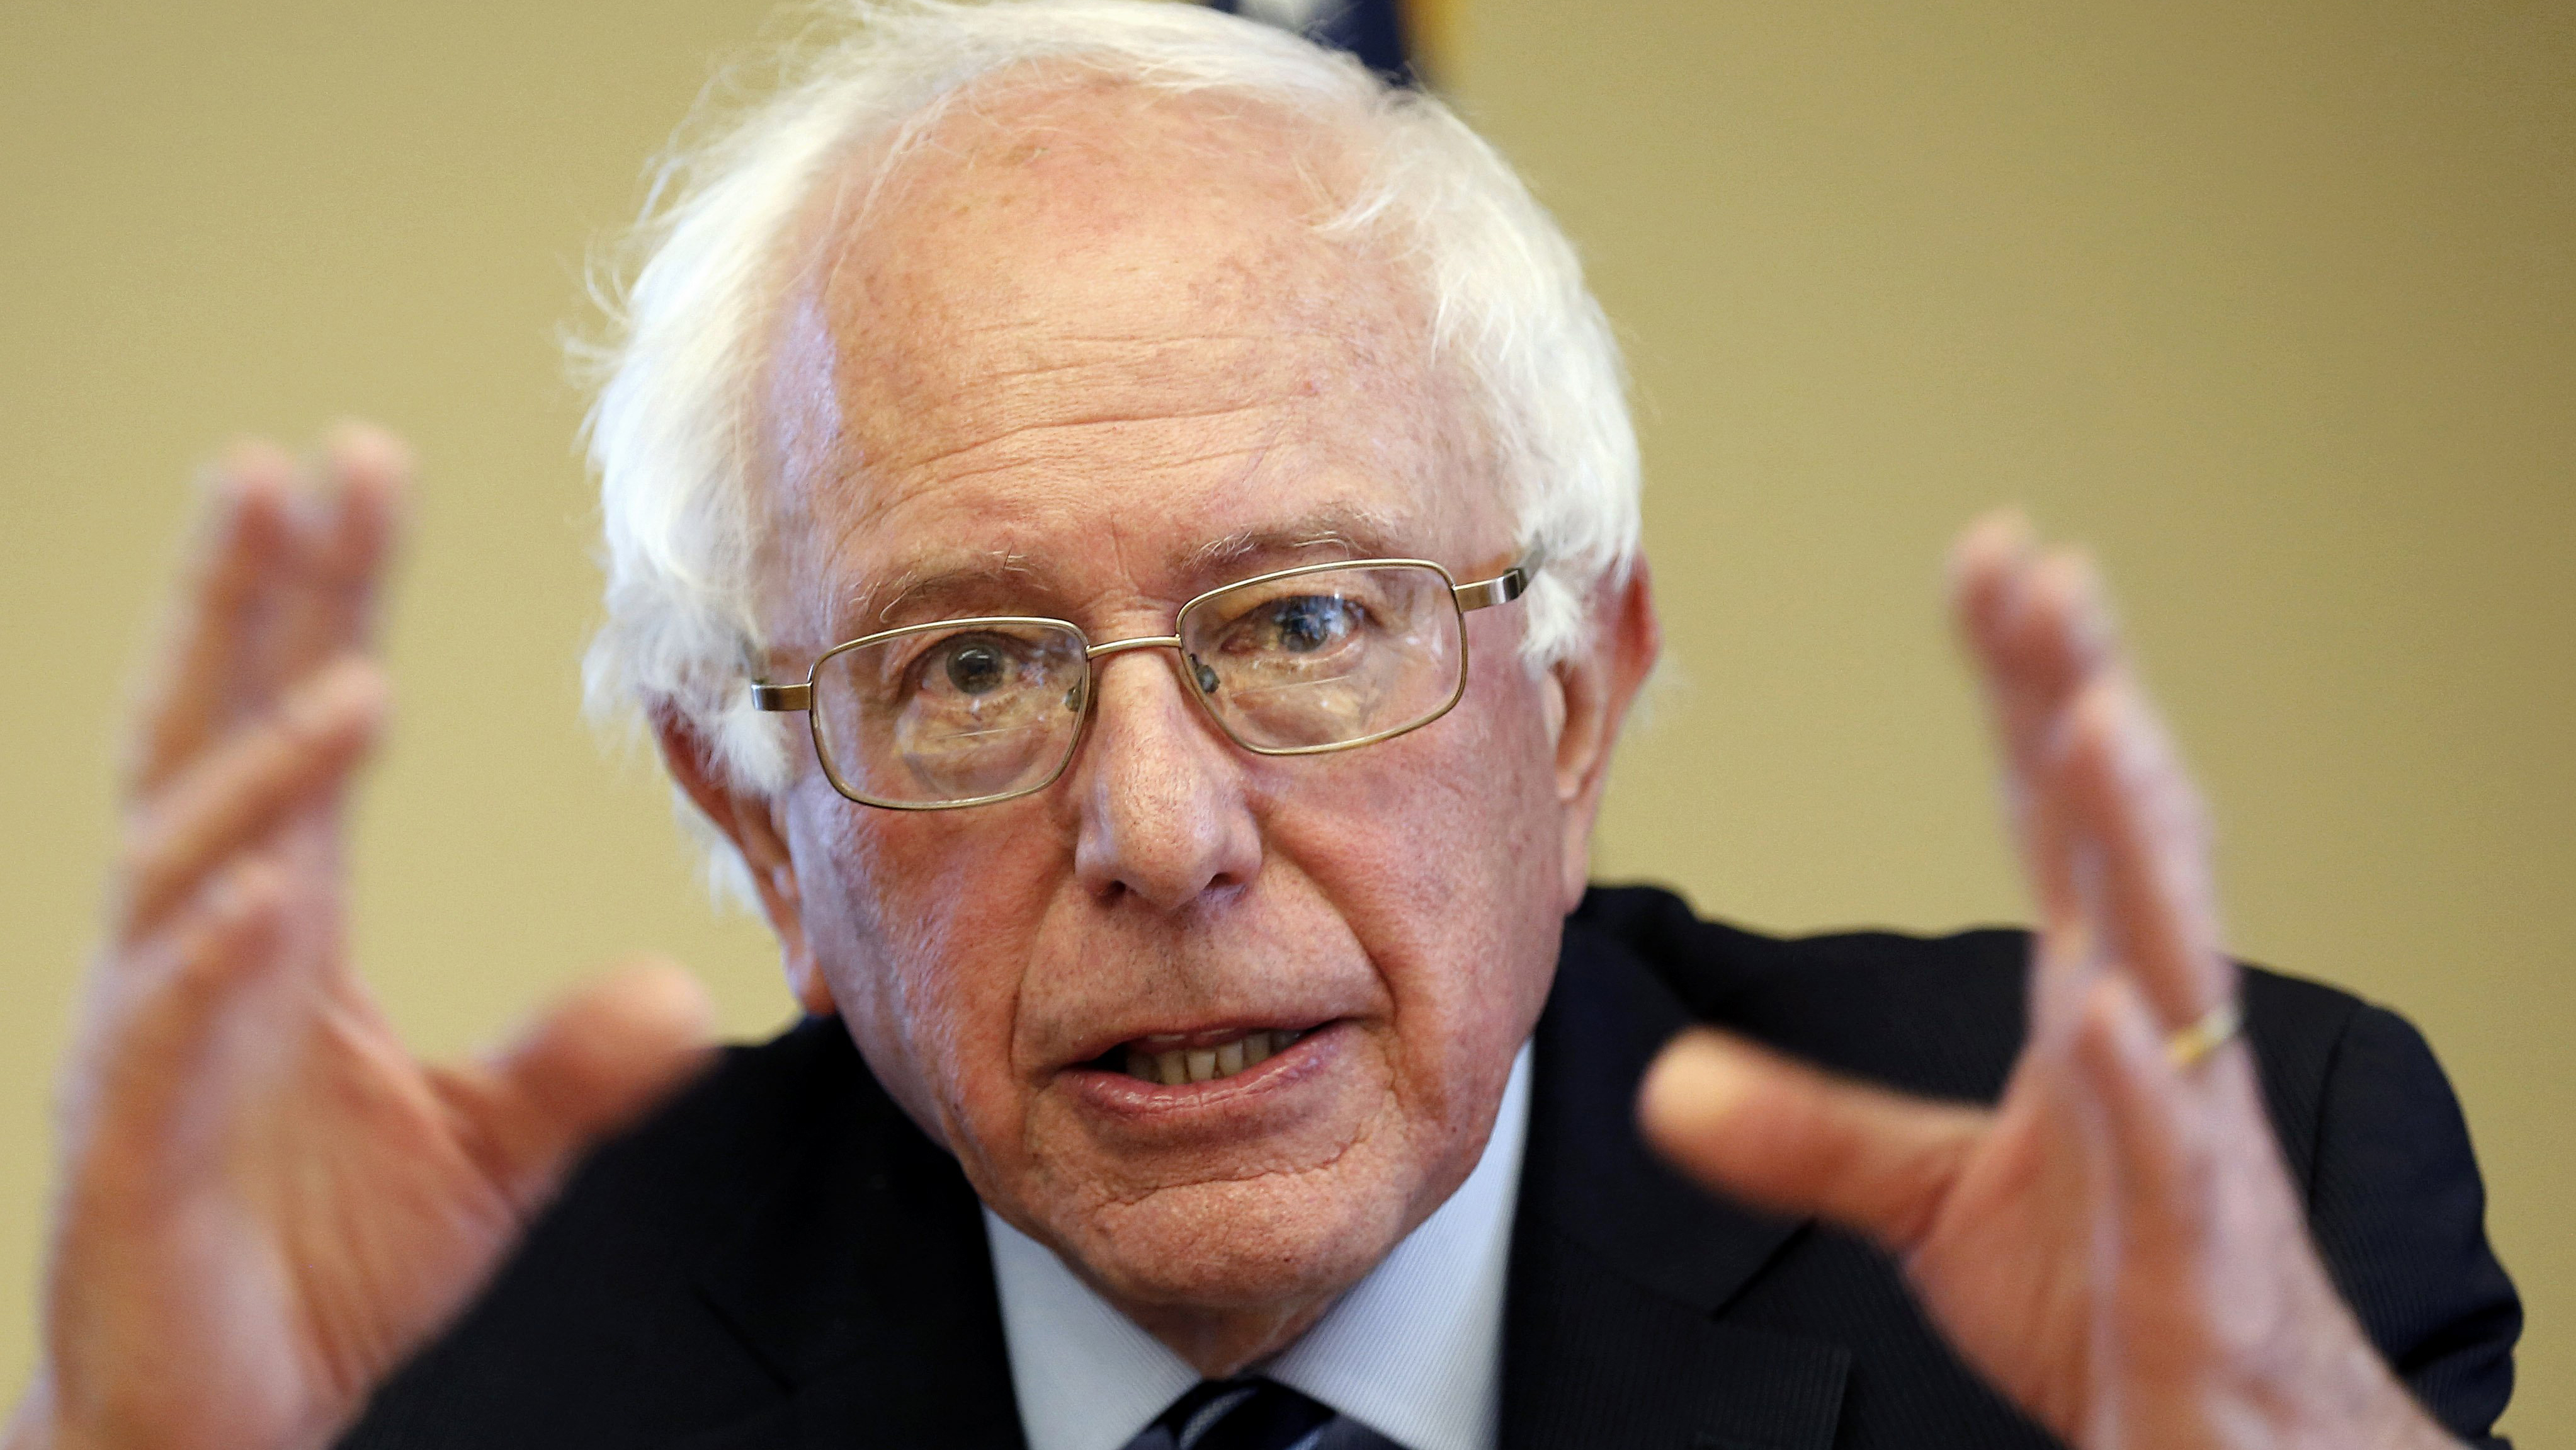 Bernie, sanders - Wikipedia